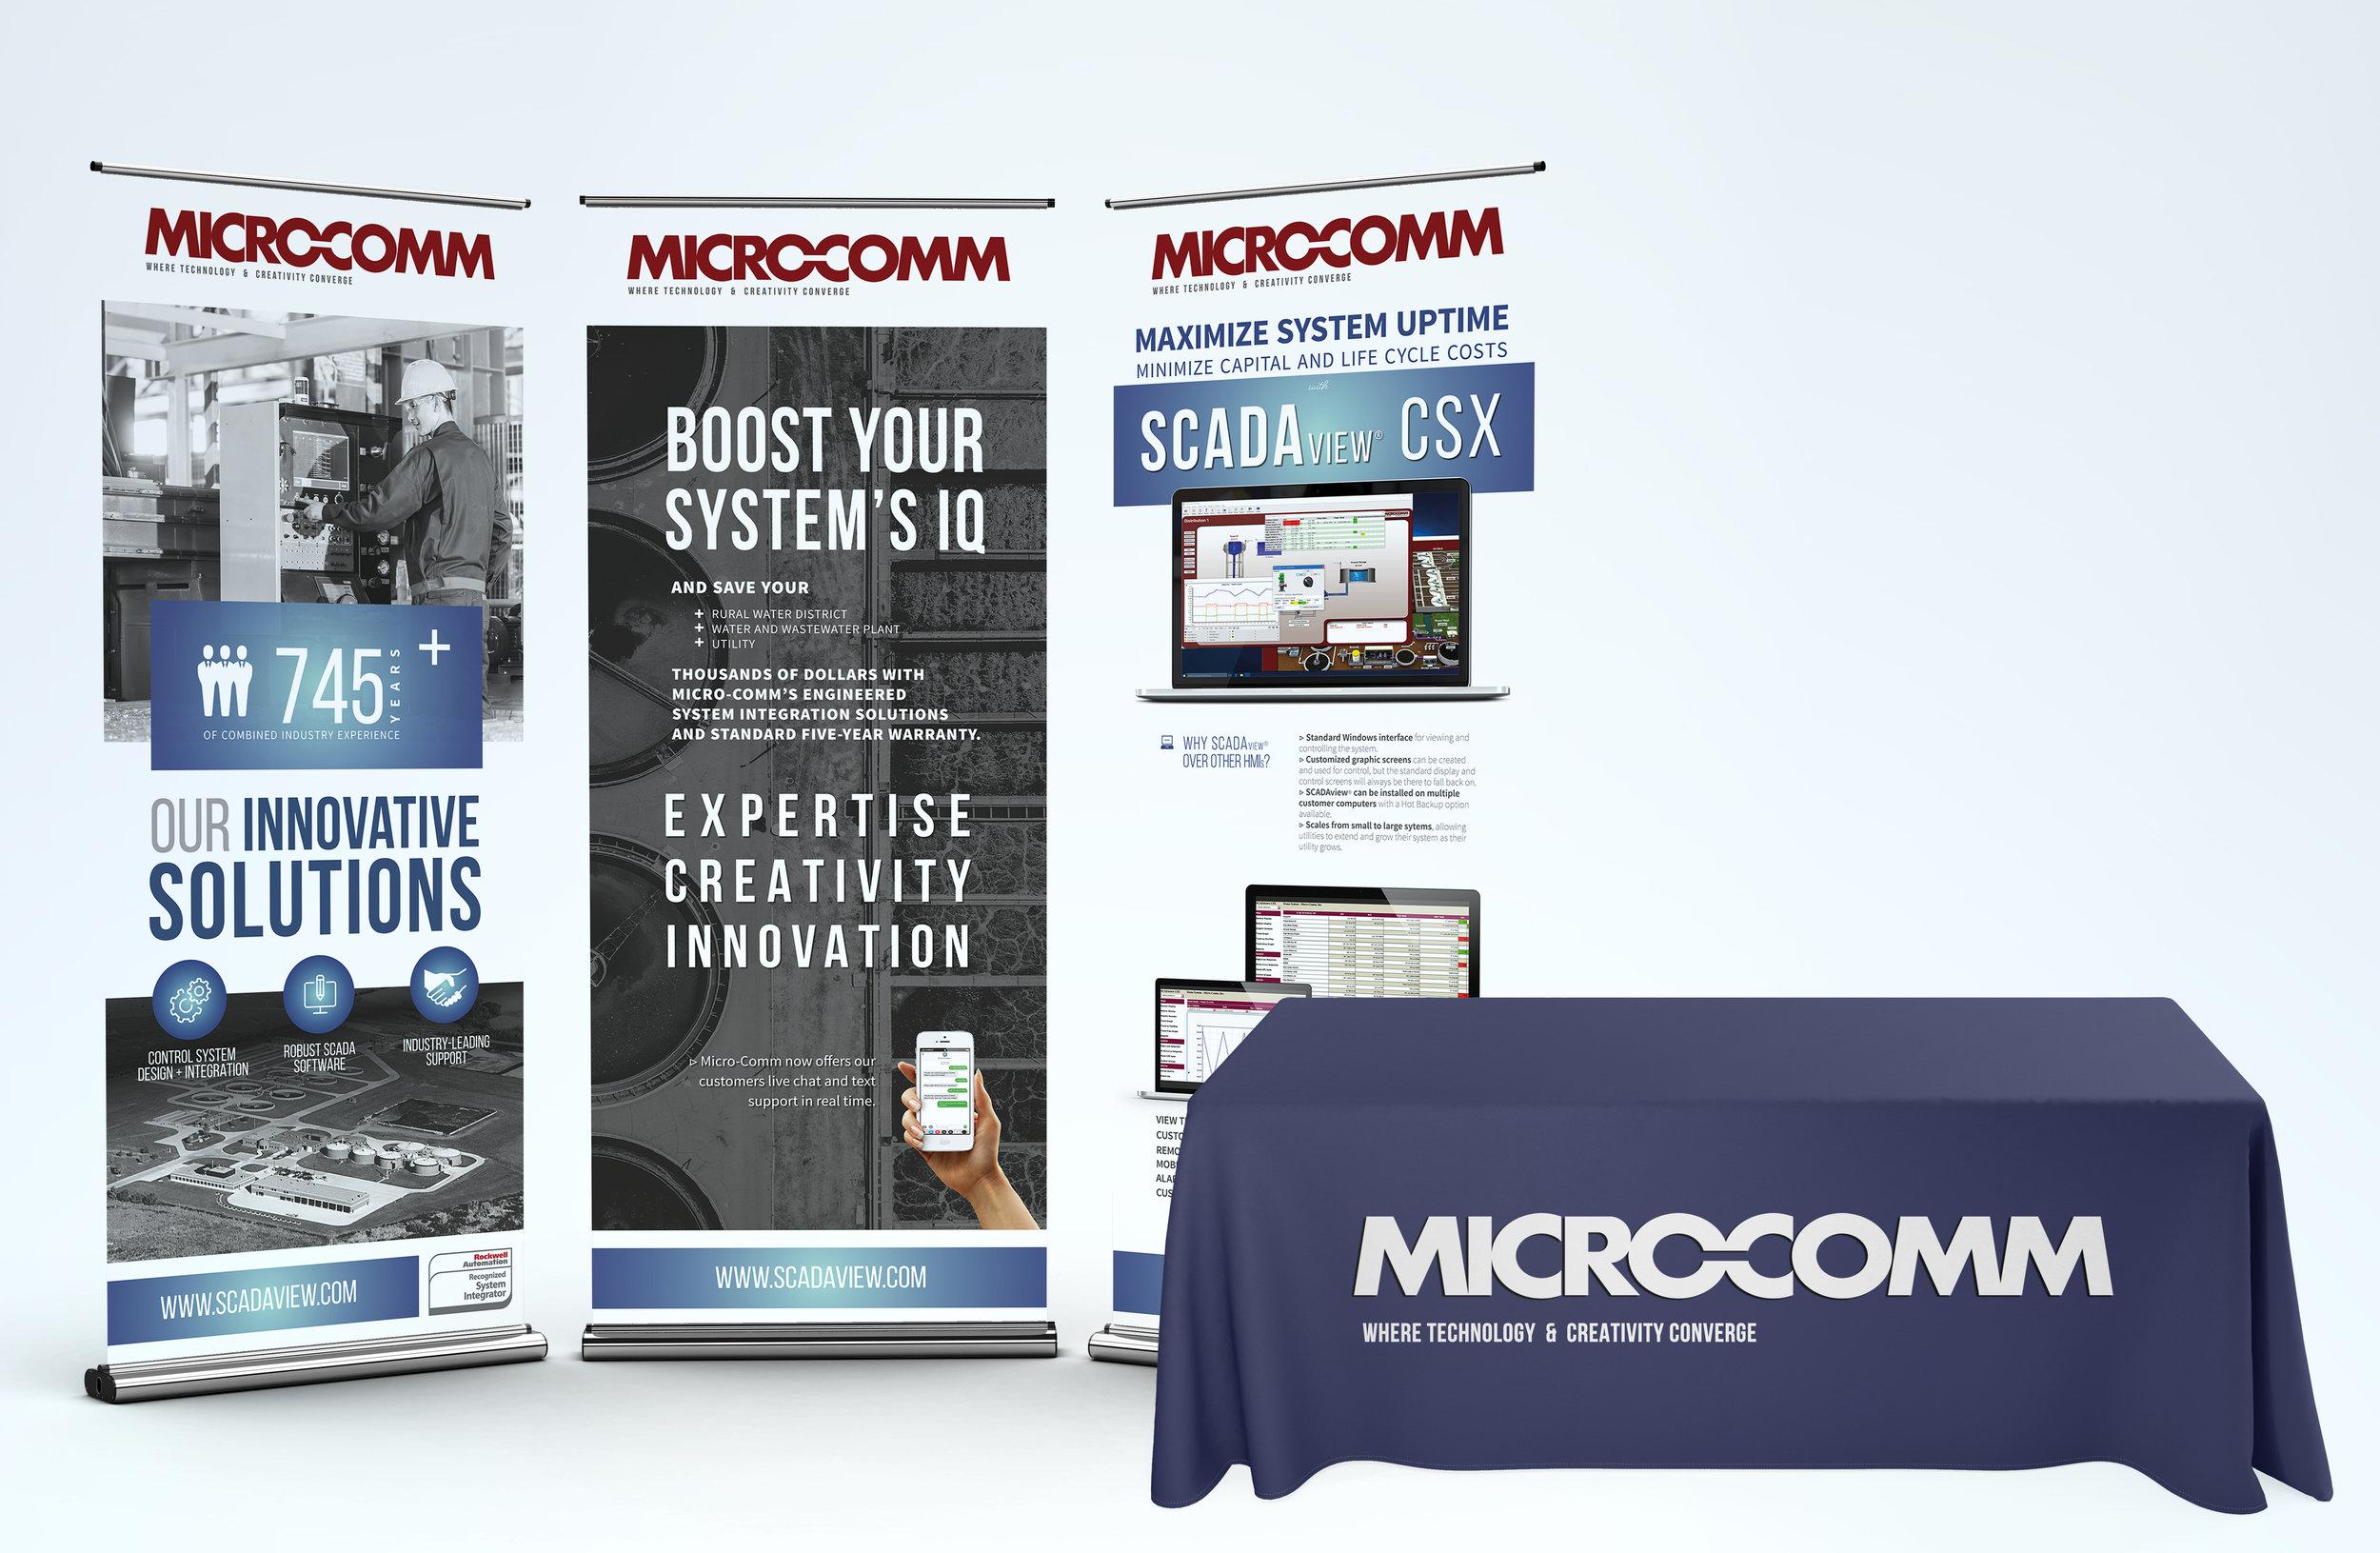 FINAL Microcomm roll-up banner mockup wednesday media.jpg